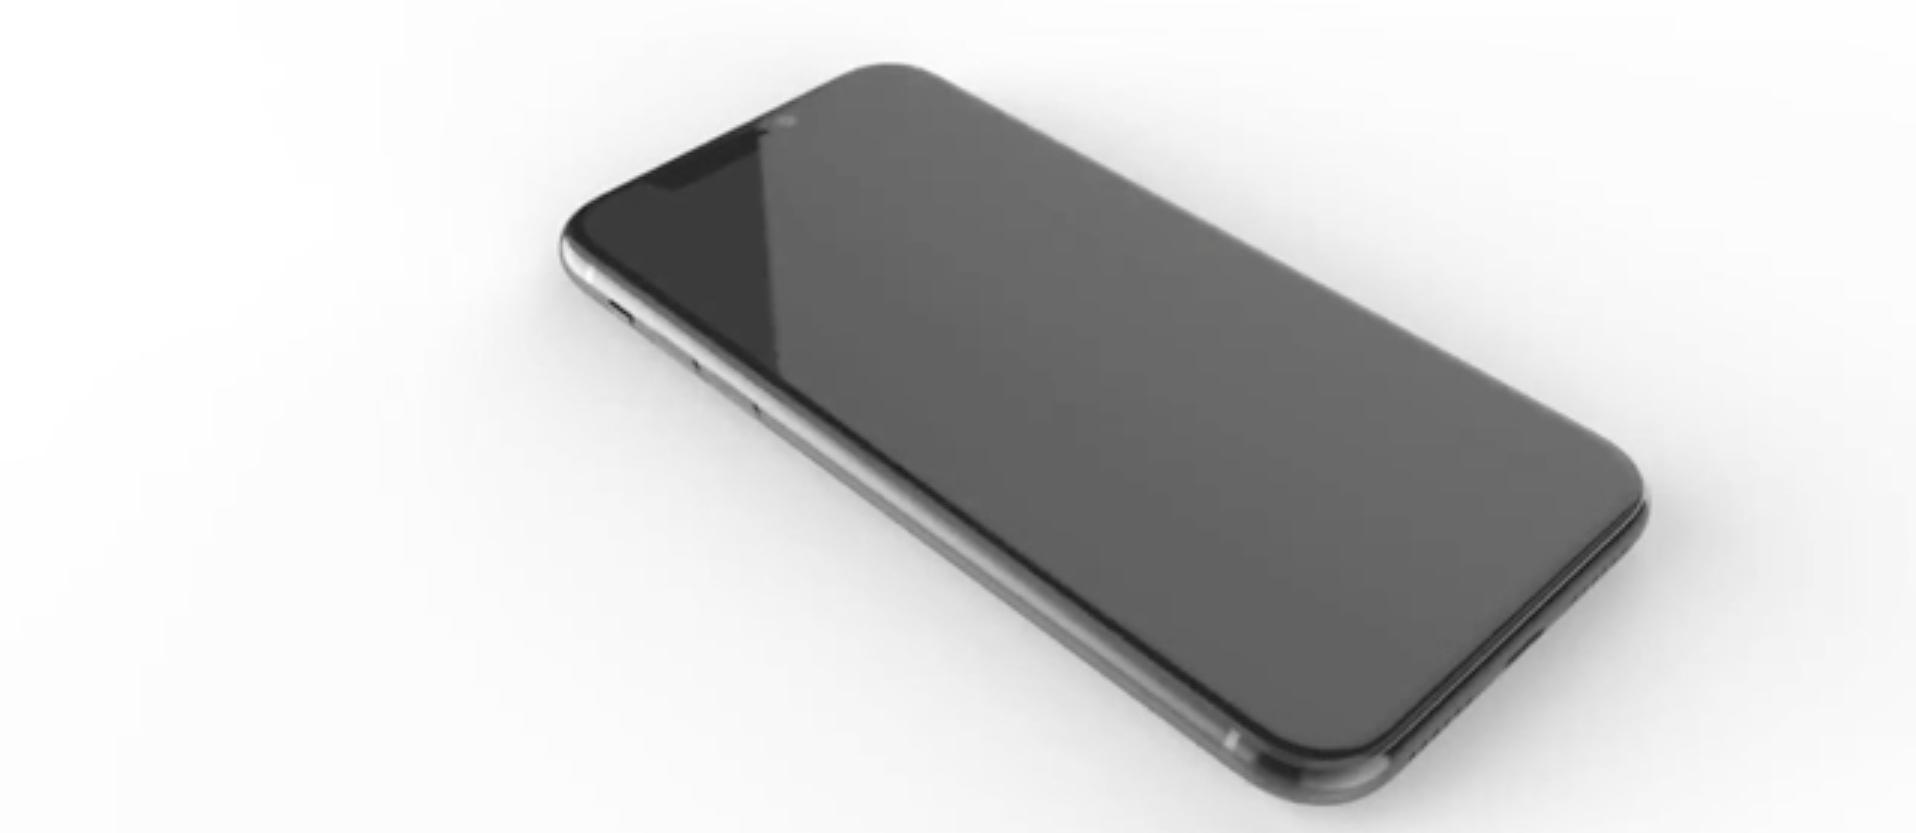 "<p>Рендер новой модели iPhone. Фото &copy; Twitter/<a href=""https://twitter.com/onleaks""><span>OnLeaks</span></a></p>"